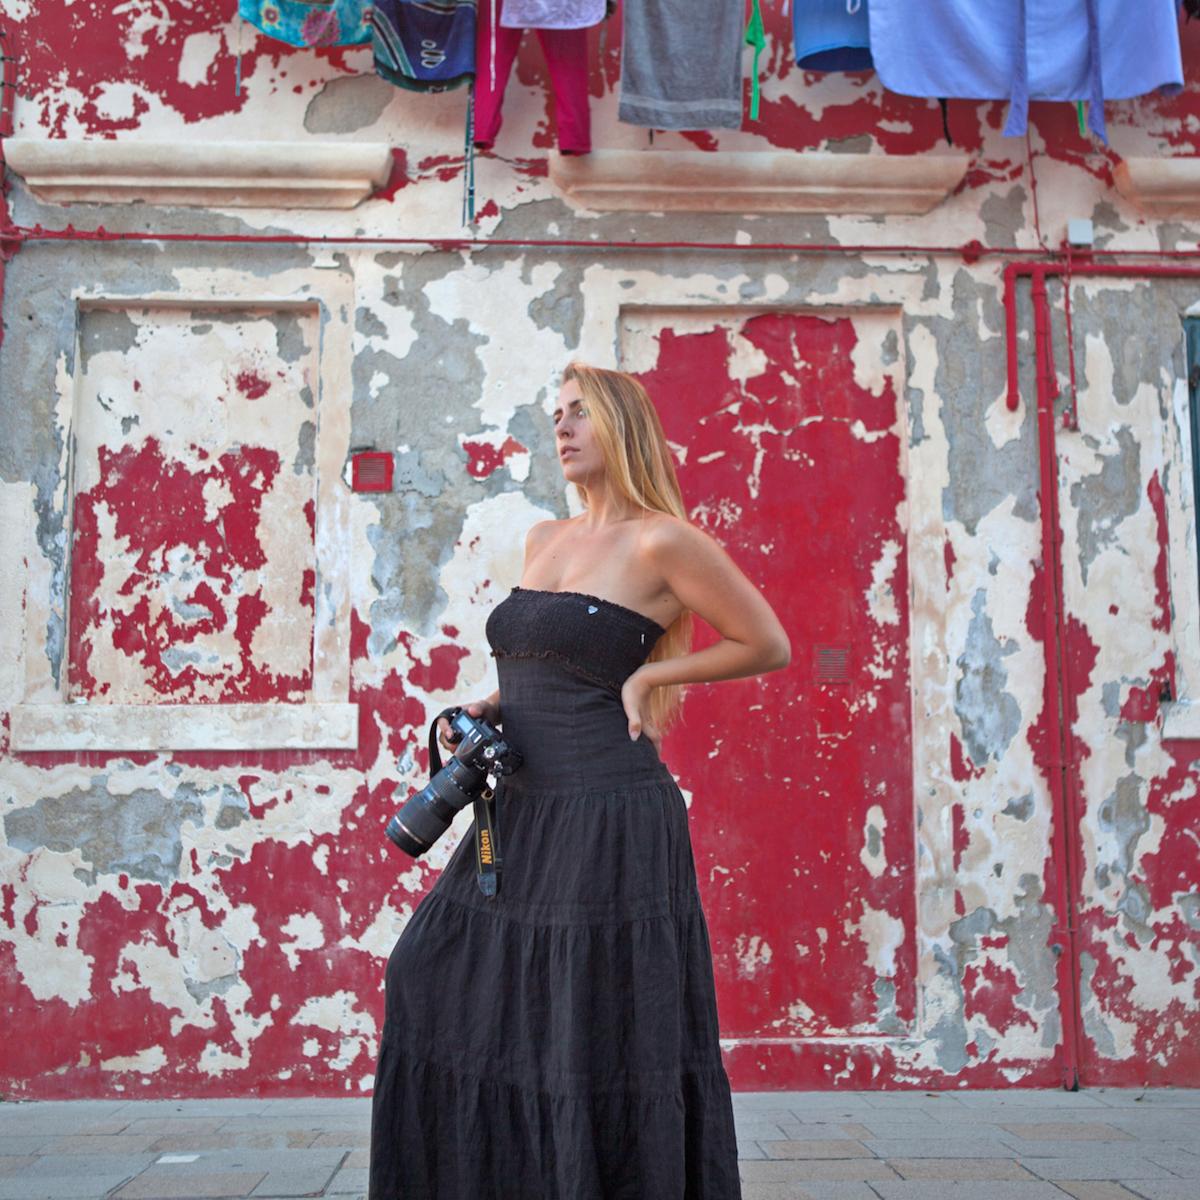 Irene Ferri Marketing, Photography, Content Creation 72